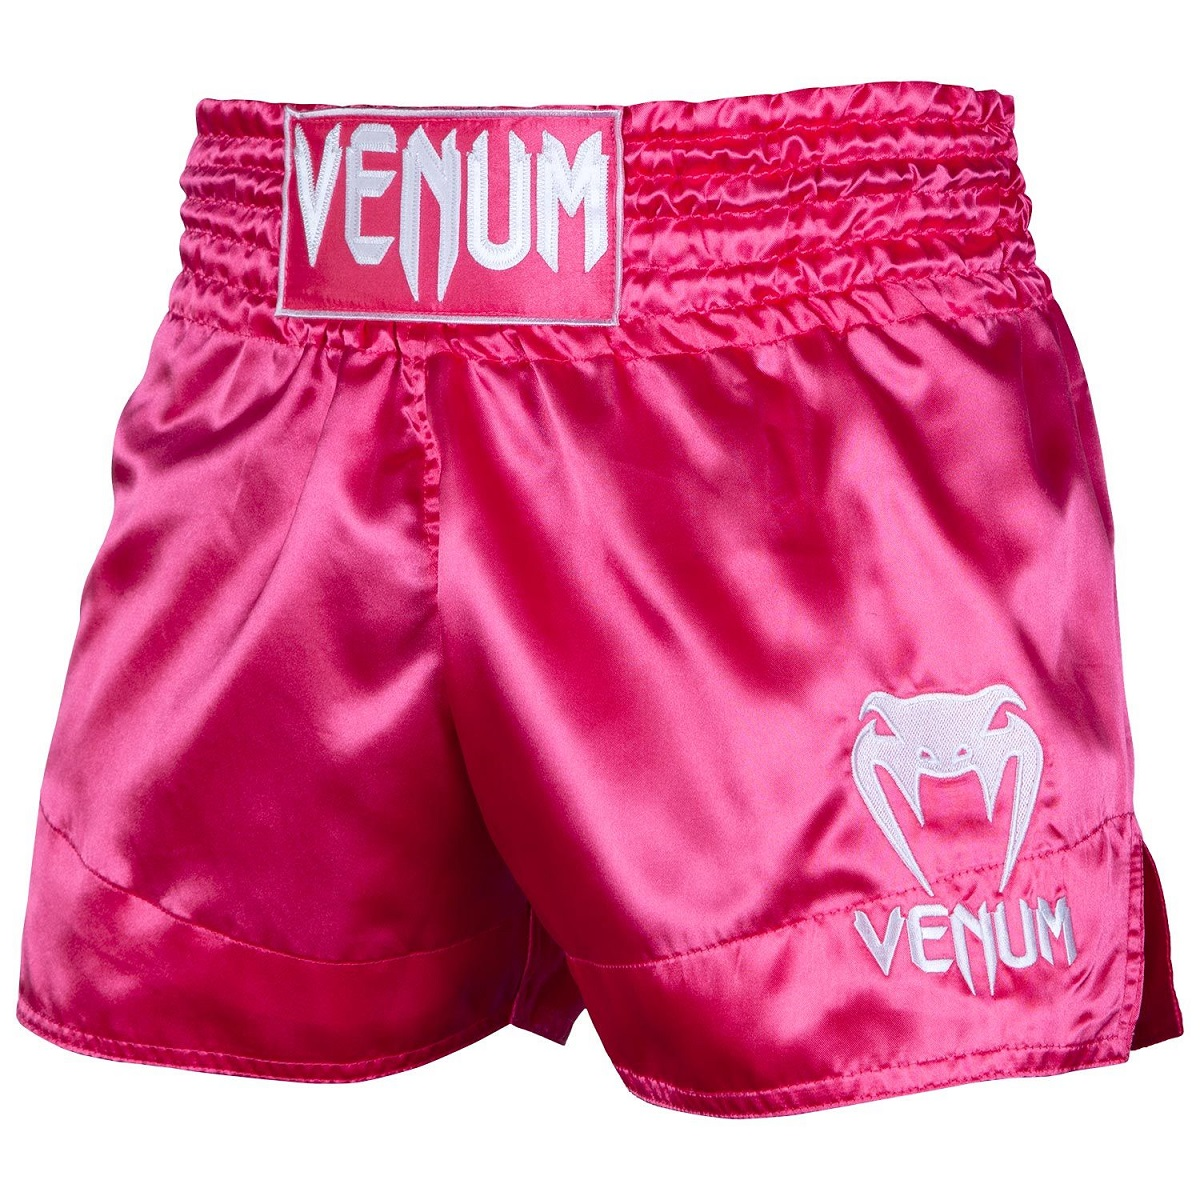 Venum Essential Racer Back Sports Bra Top Pink